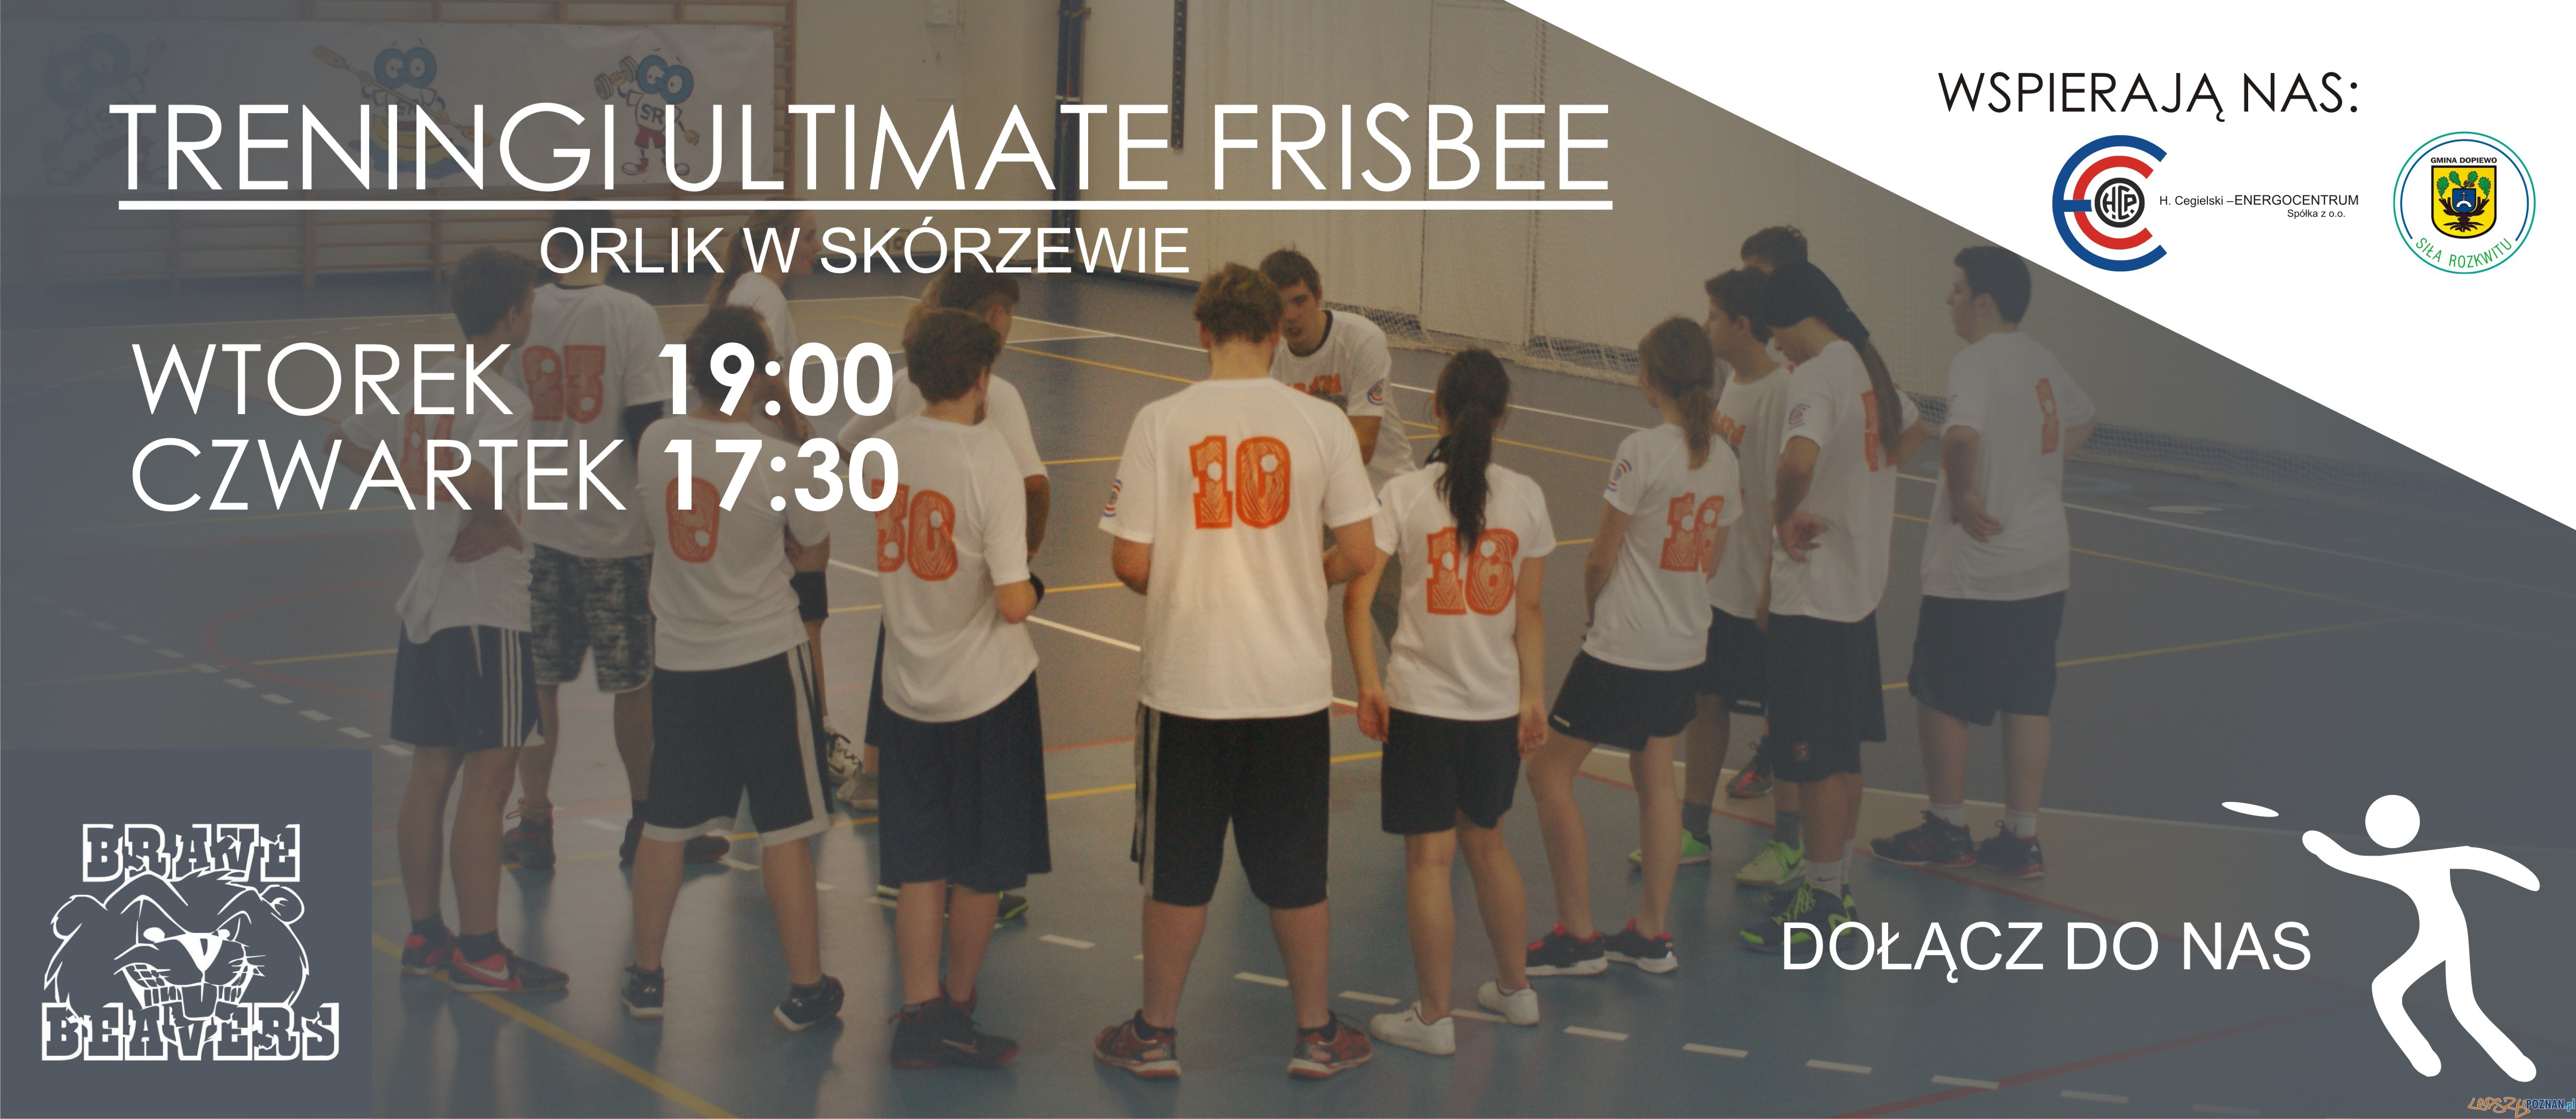 Zaproszenie na trening frisbee  Foto: